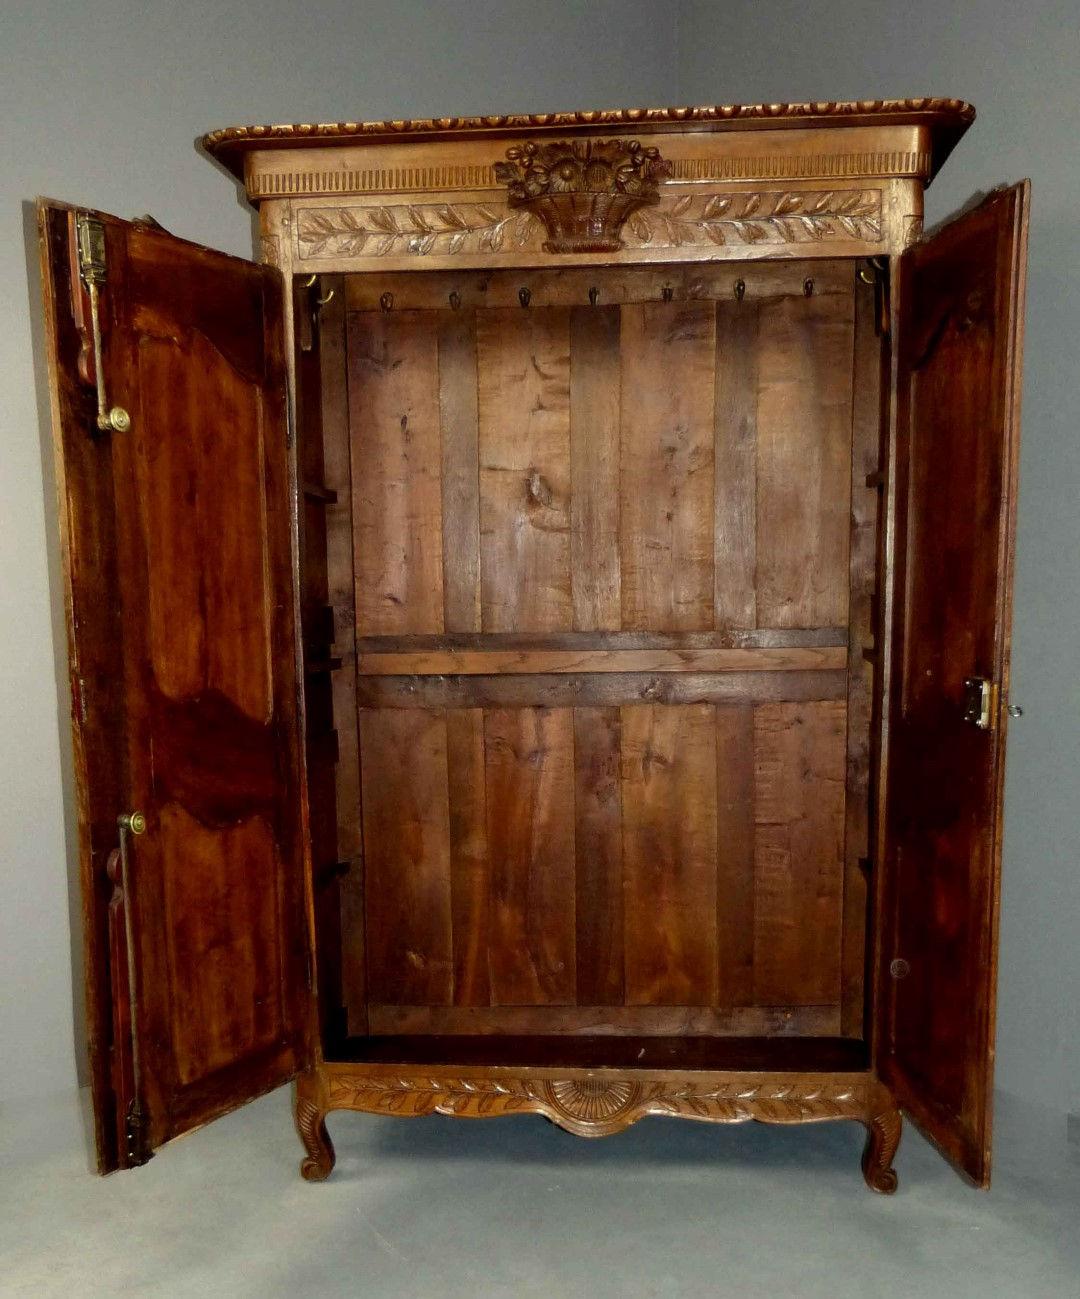 Muebles de cocina antiguos de segunda mano for Armarios de cocina antiguos